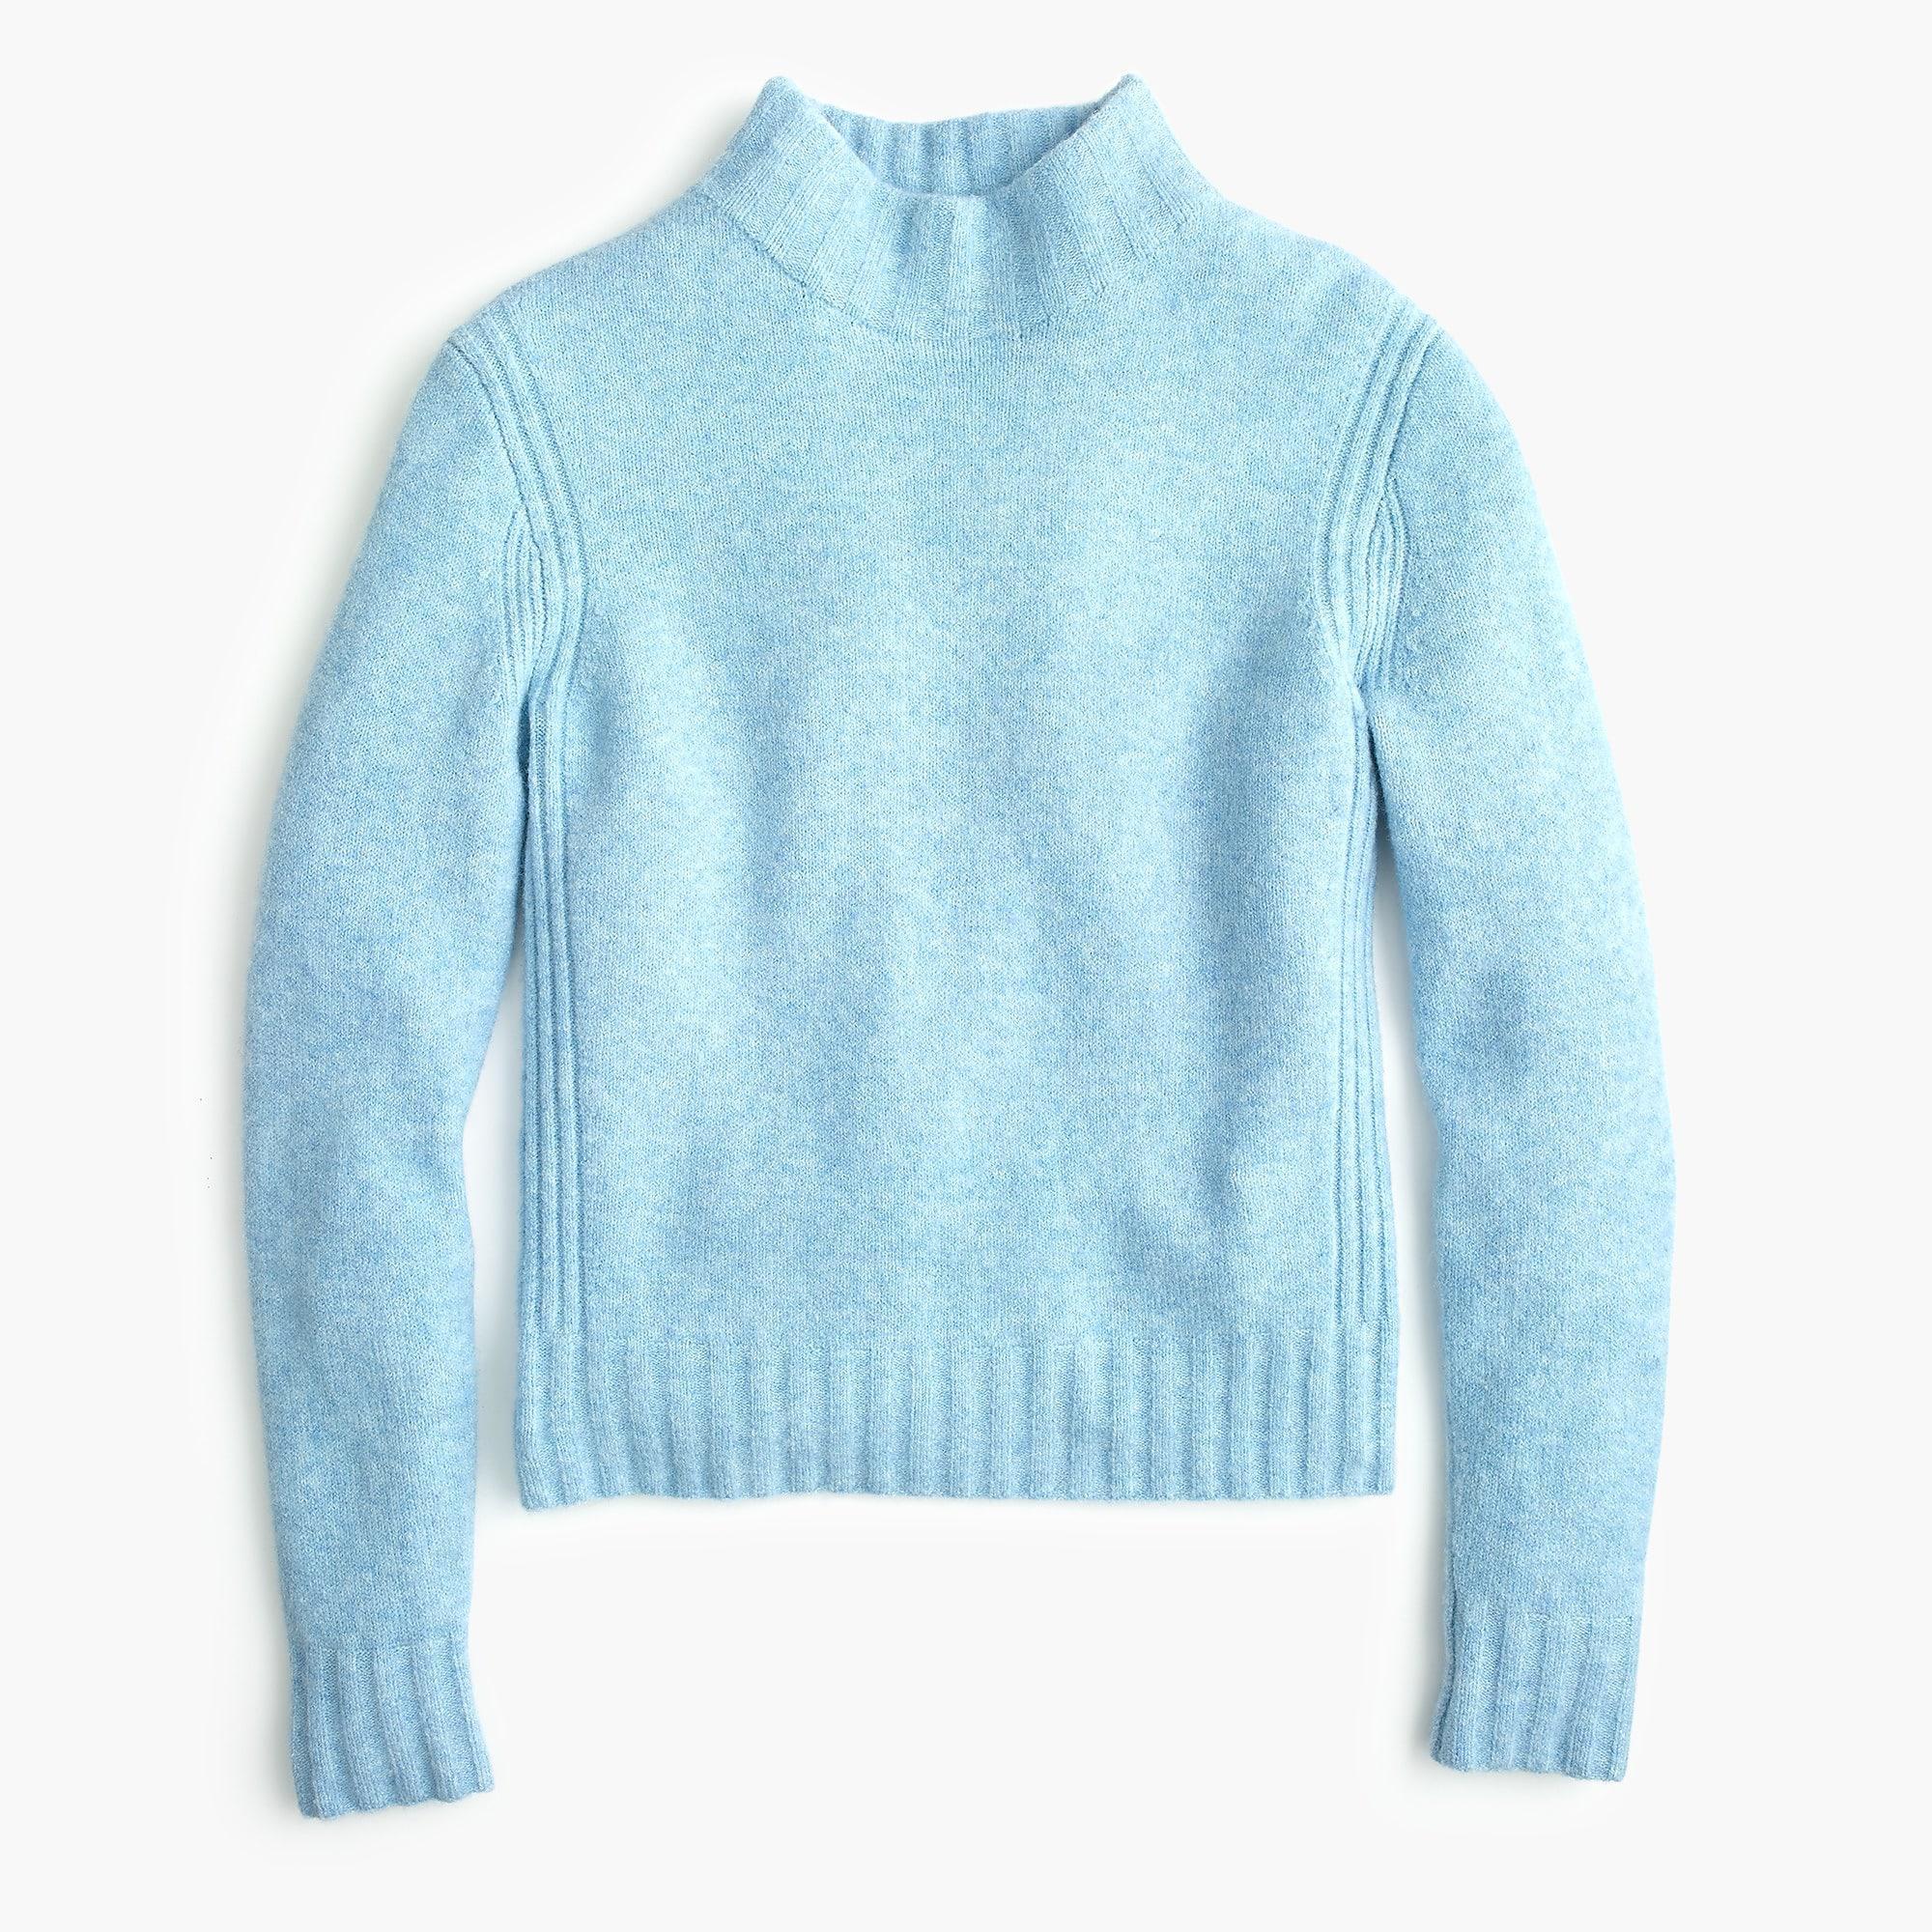 693f6512ddf J.Crew Mockneck Sweater In Supersoft Yarn in Blue - Lyst